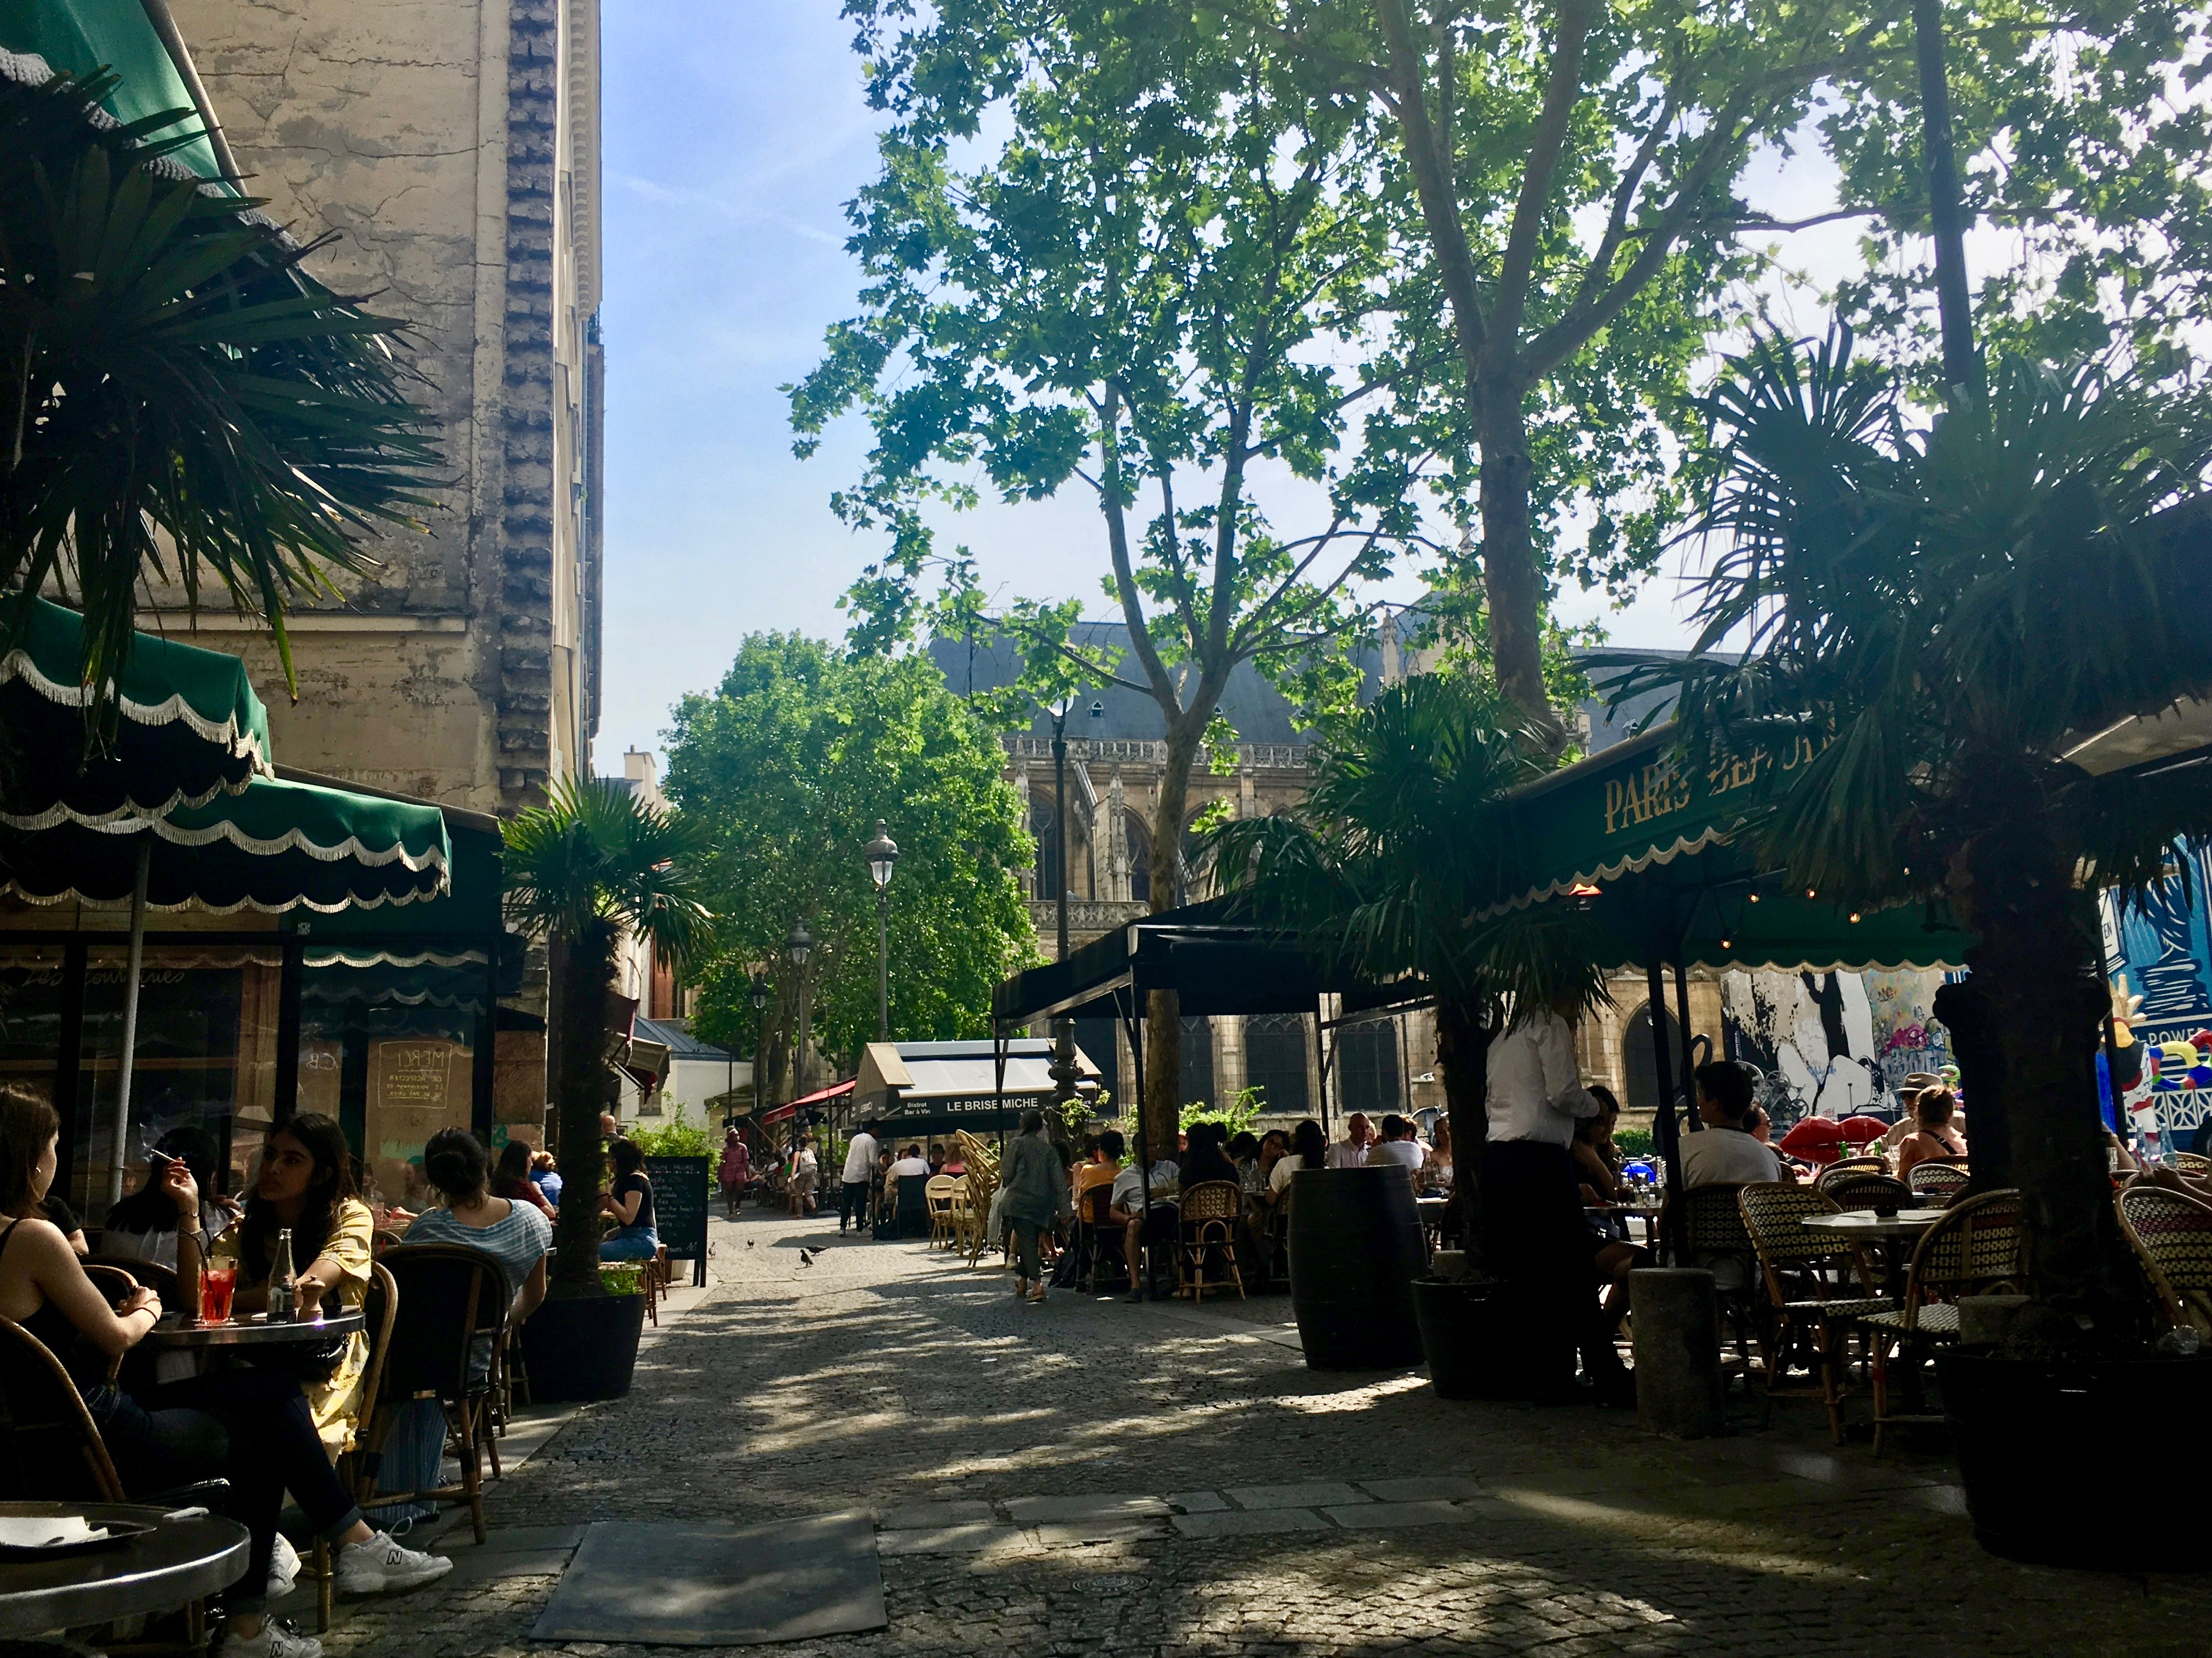 okolice Pompidou